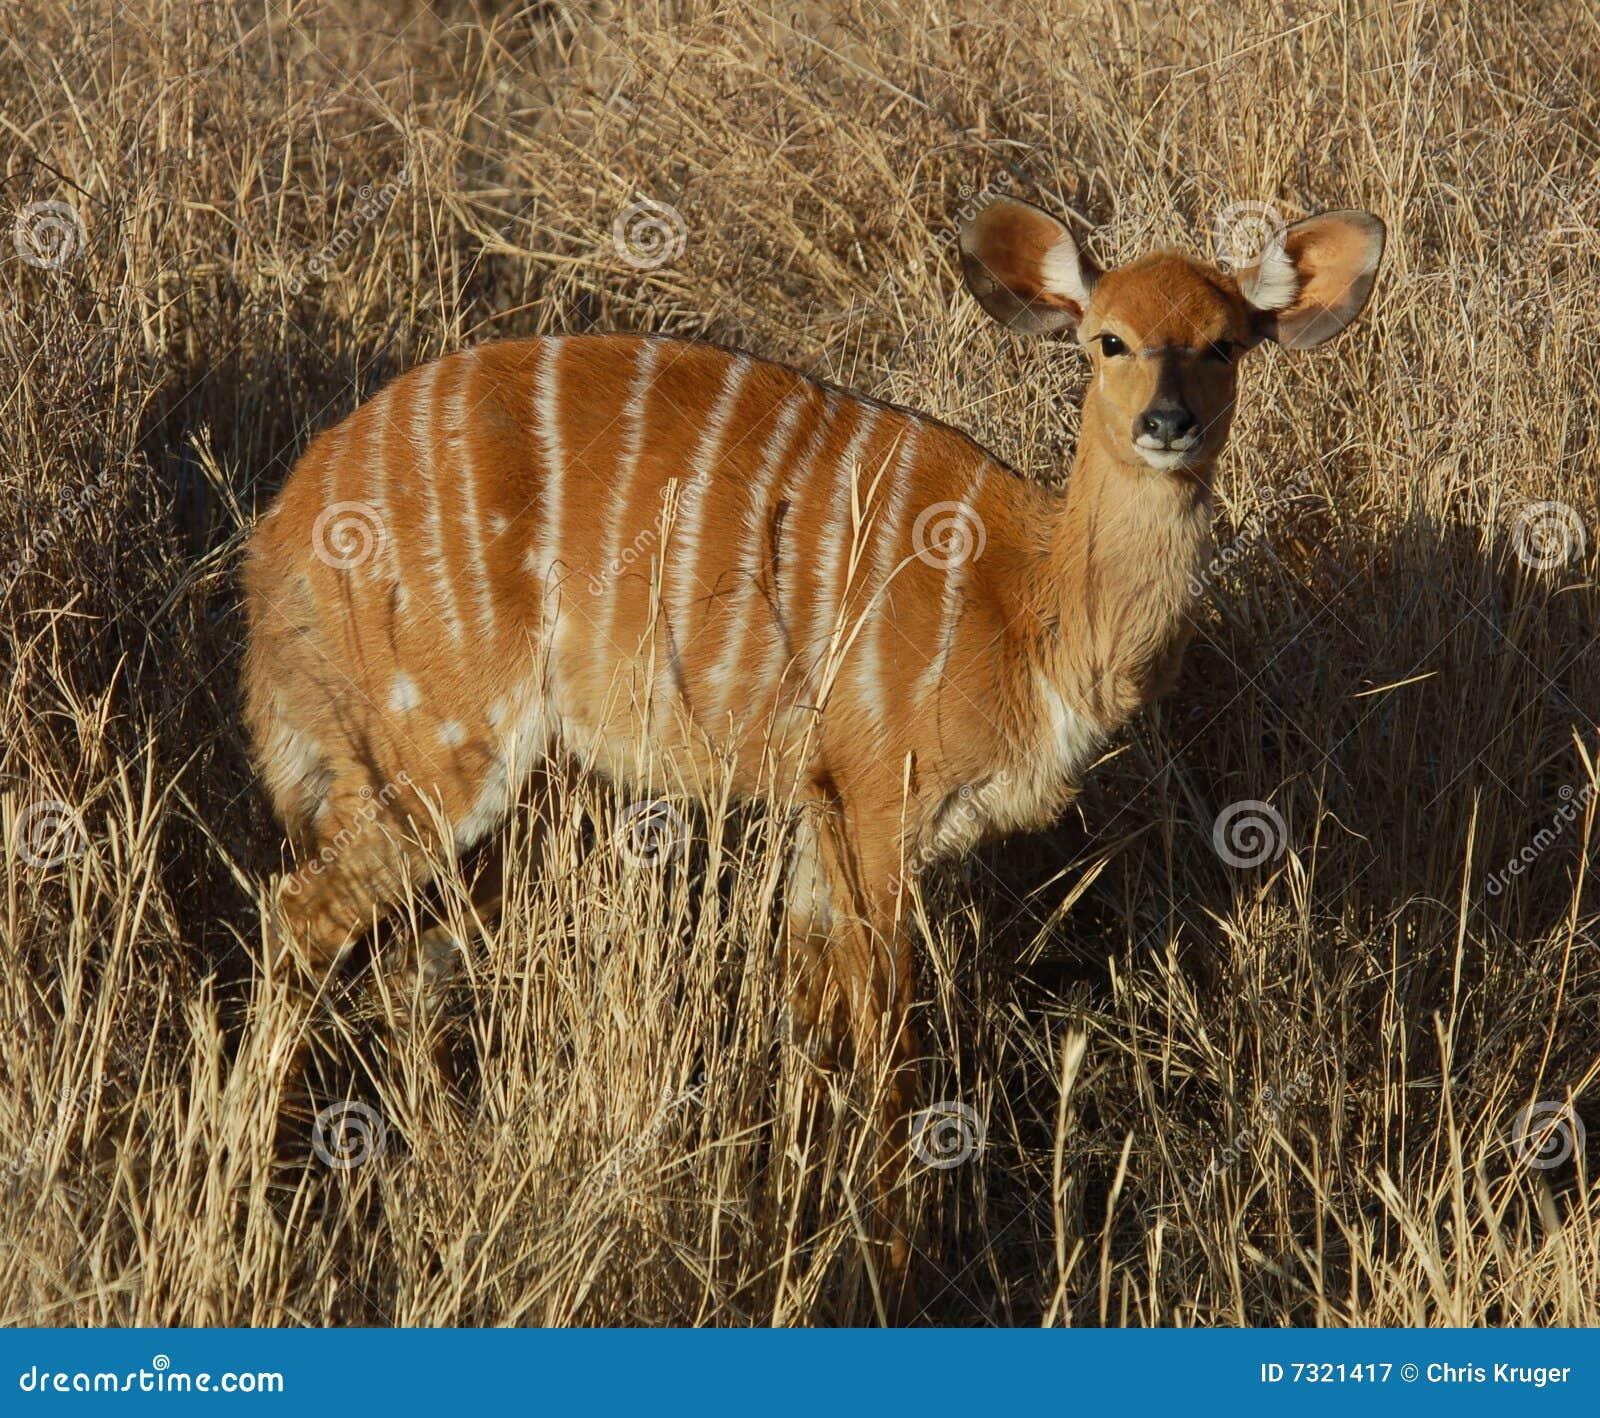 Fauna selvatica dell Africa: Antilope del Nyala